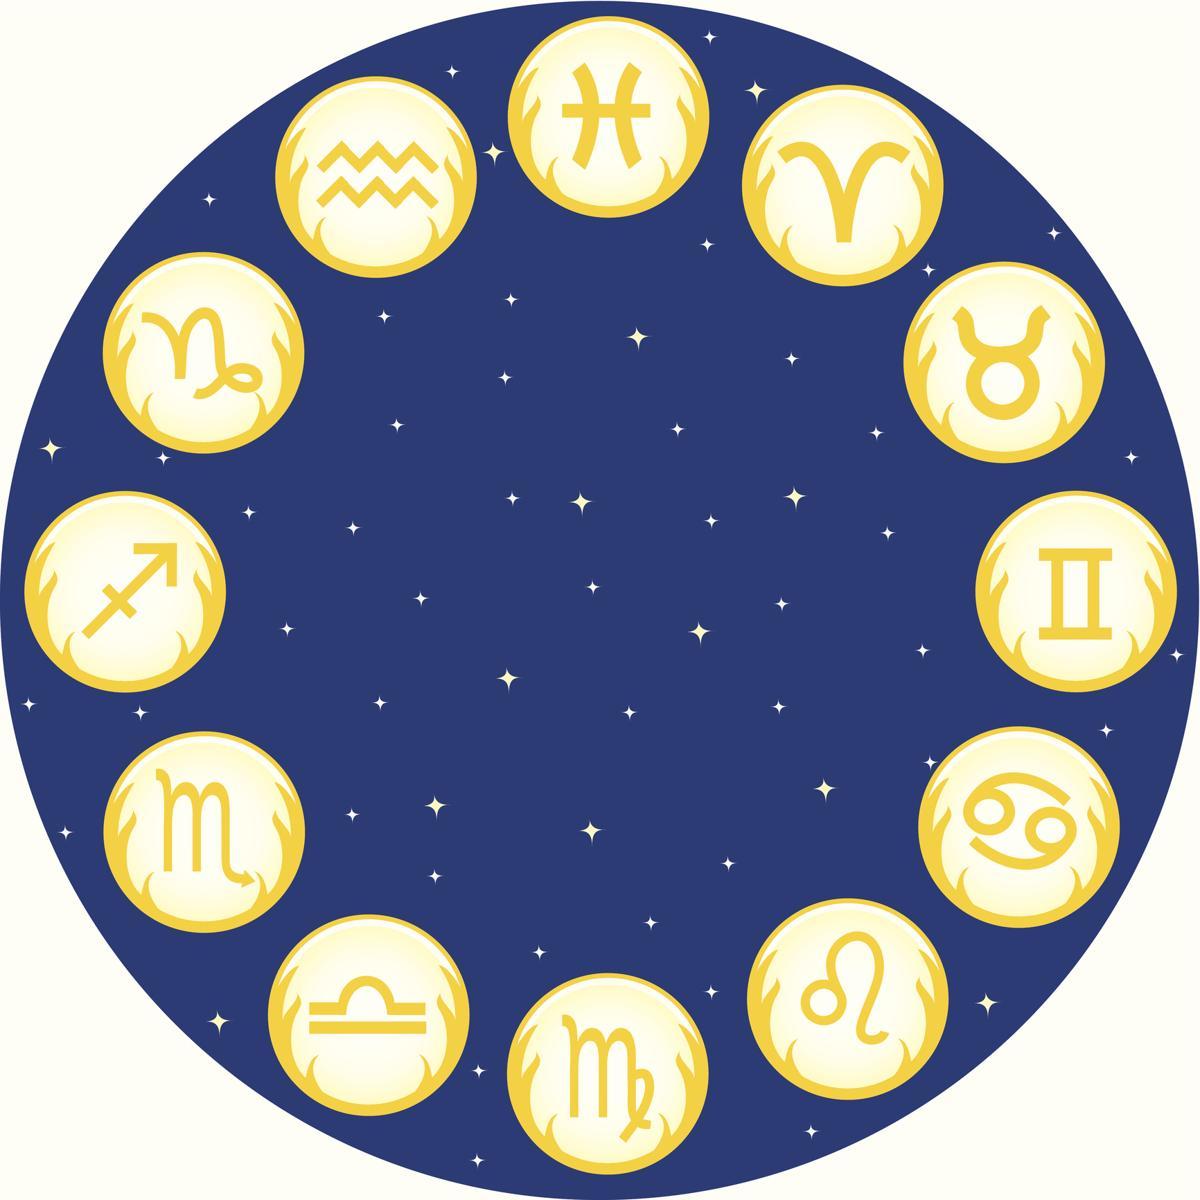 Horoscope zodiac signs characteristics